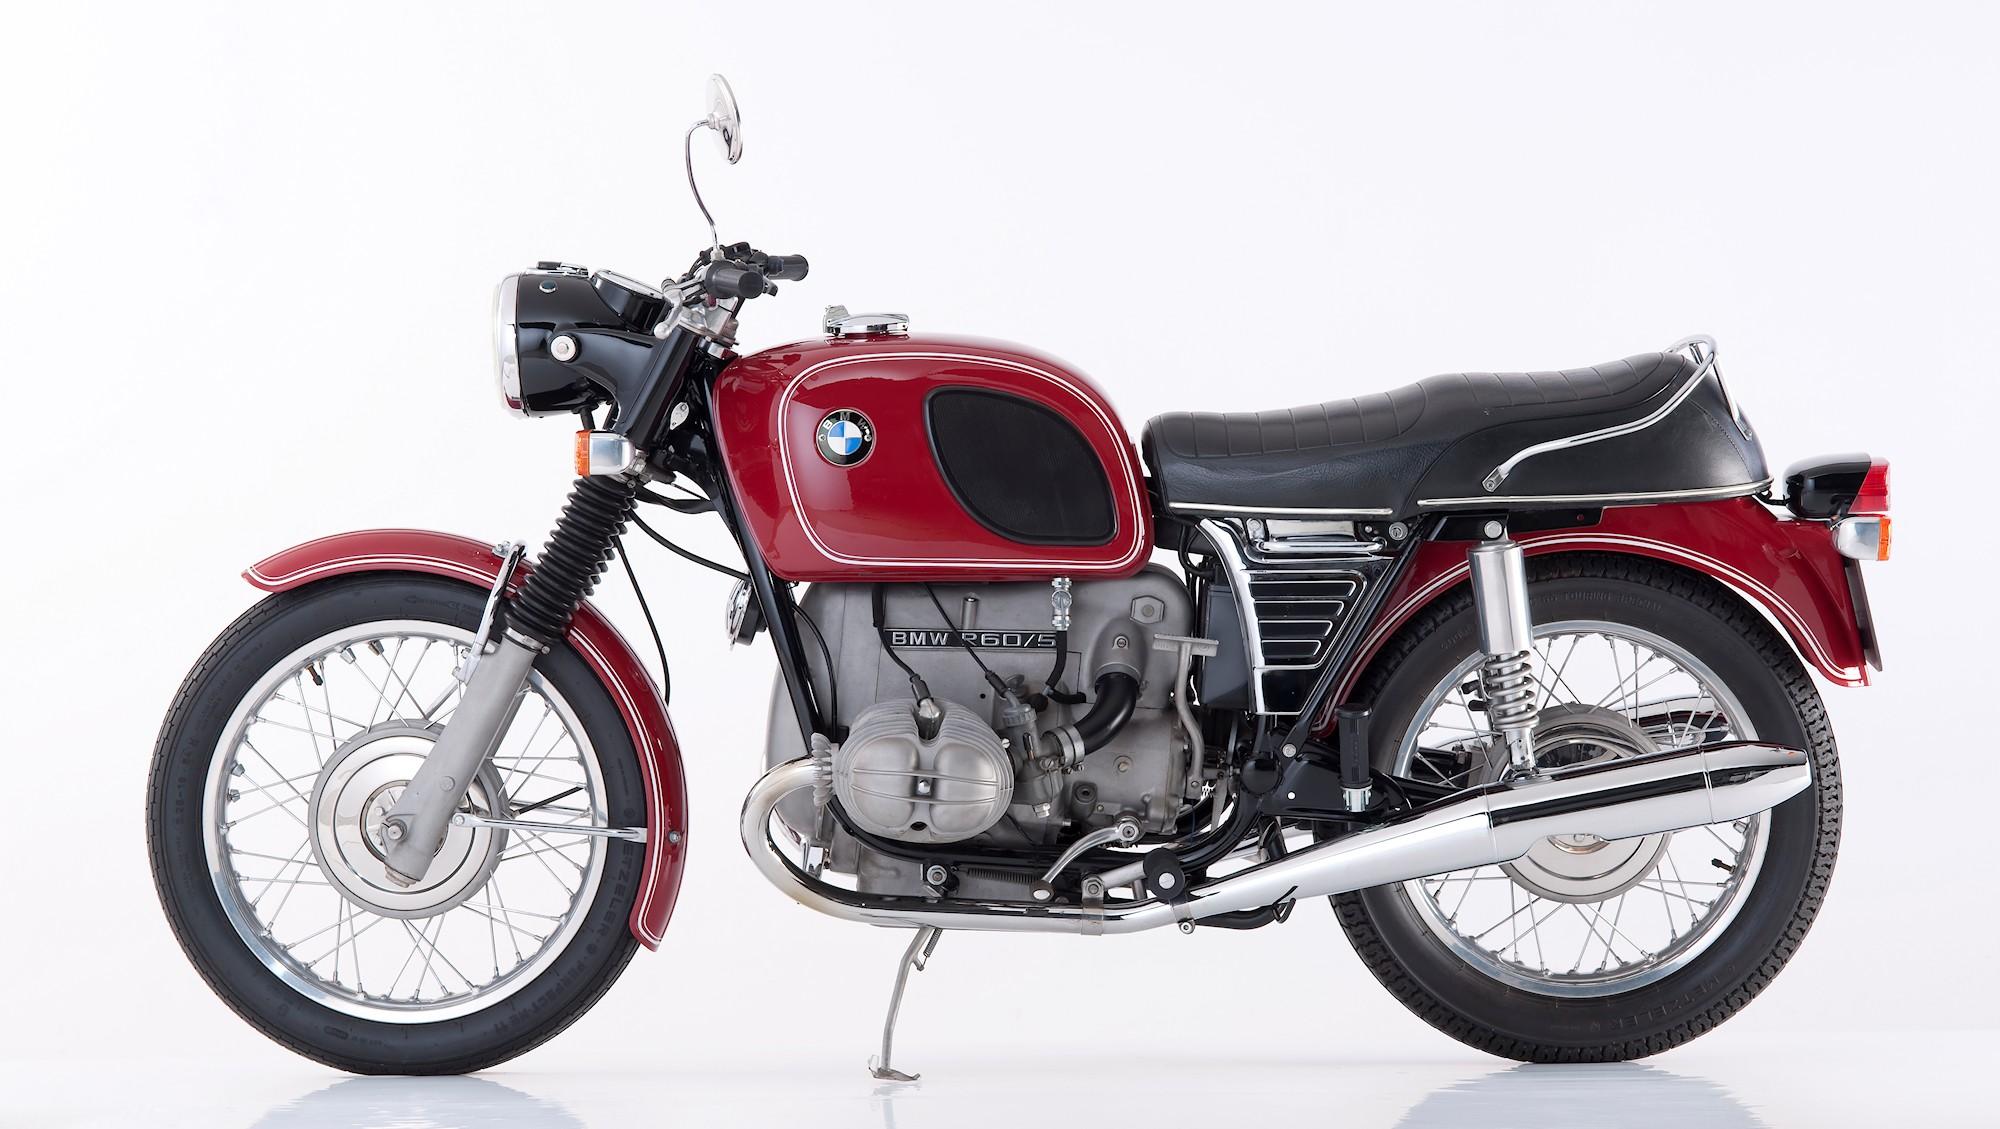 bmw r60 5 1971 fiche moto motoplanete. Black Bedroom Furniture Sets. Home Design Ideas